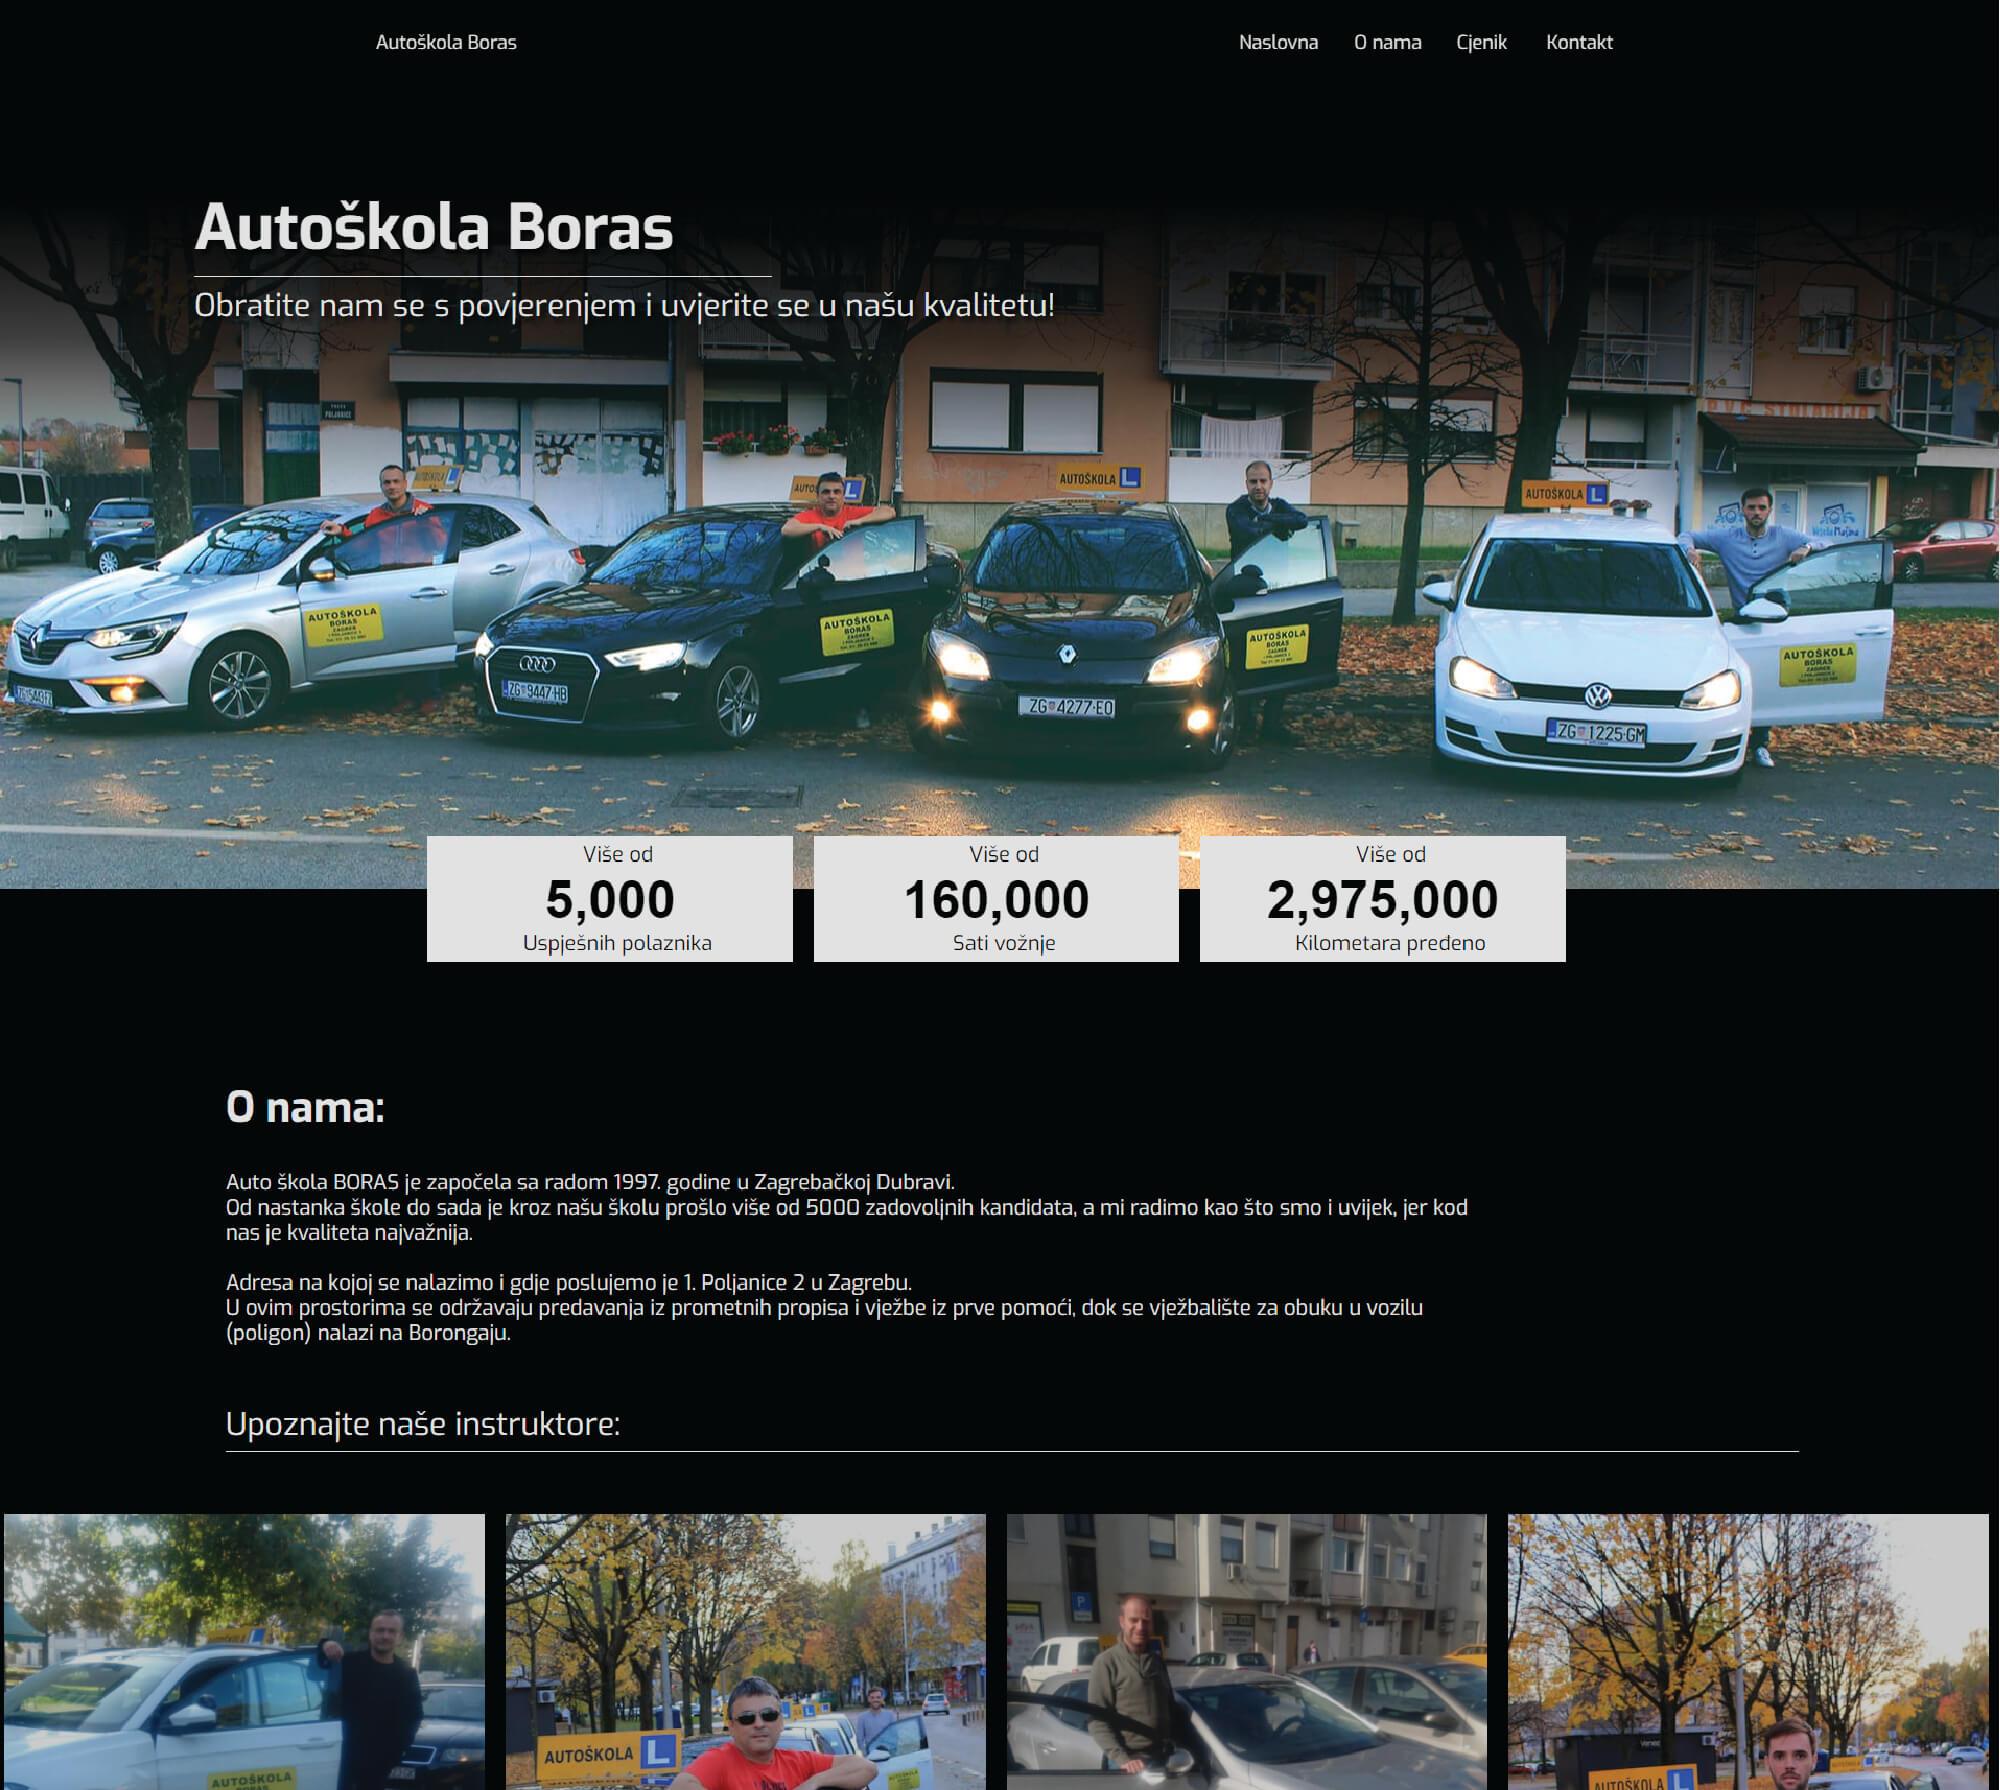 Autoskola-Boras